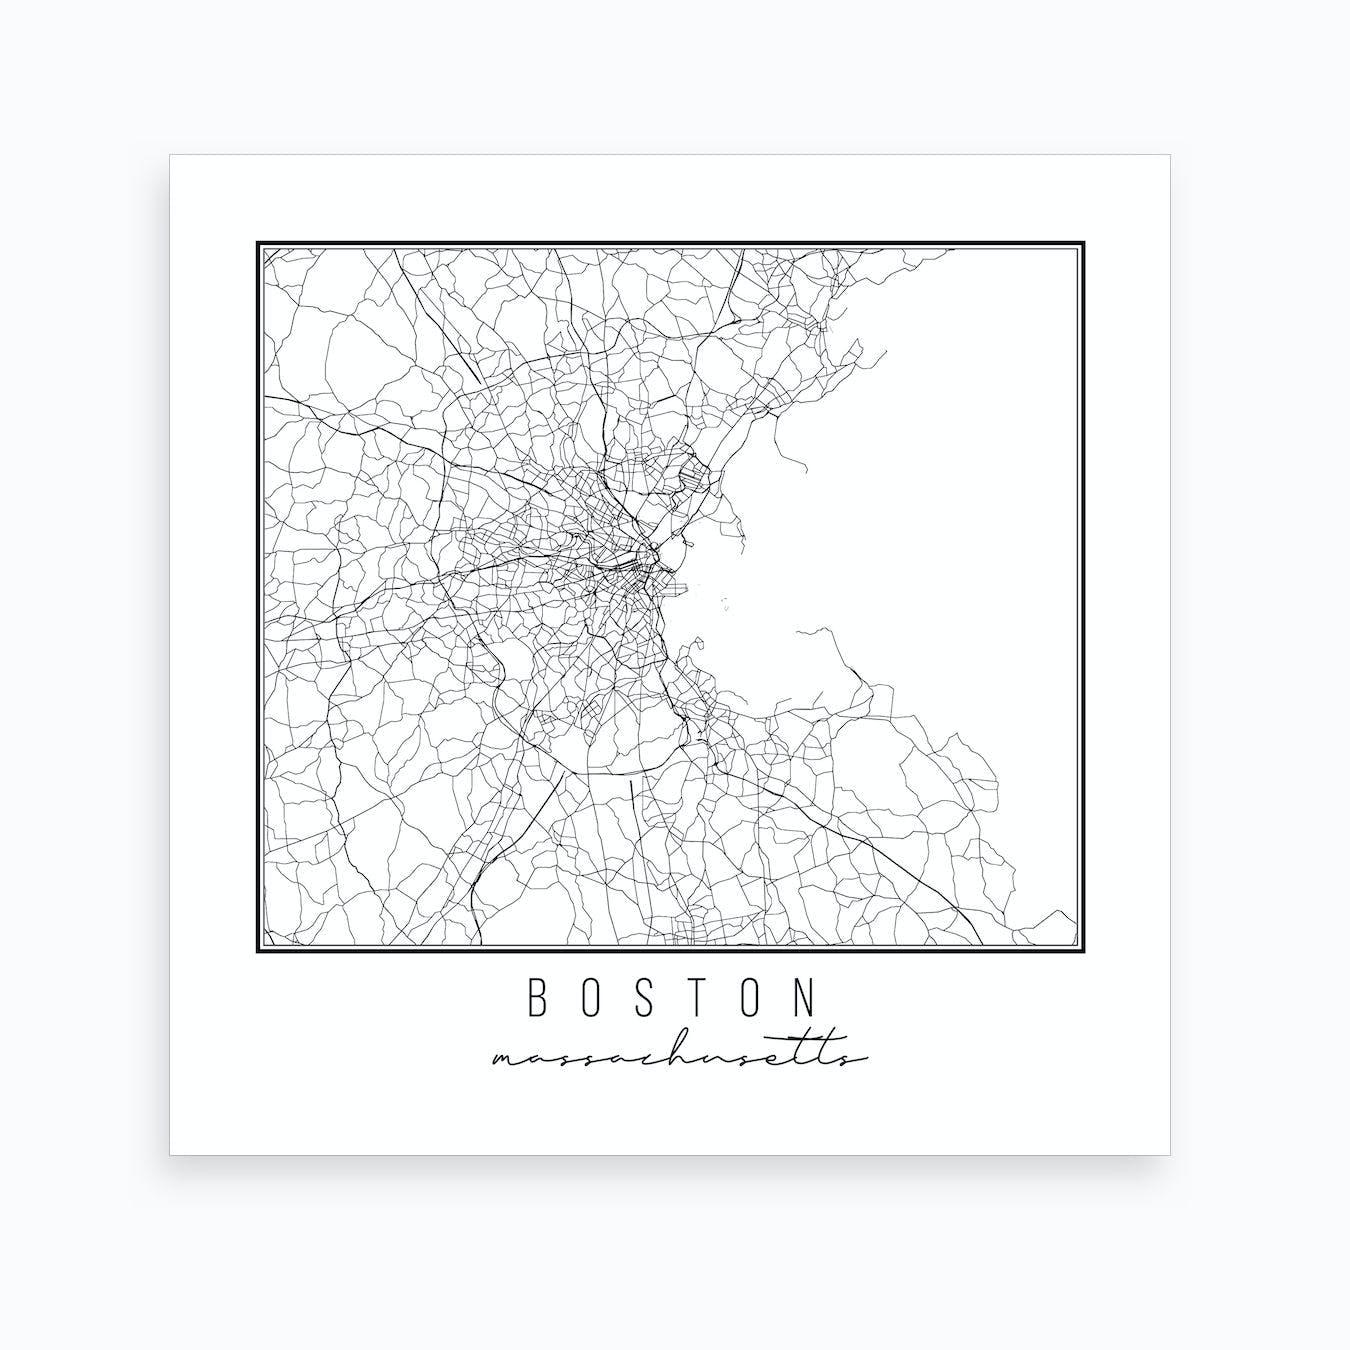 photo regarding Printable Map of Massachusetts called Boston Machusetts Road Map Artwork Print